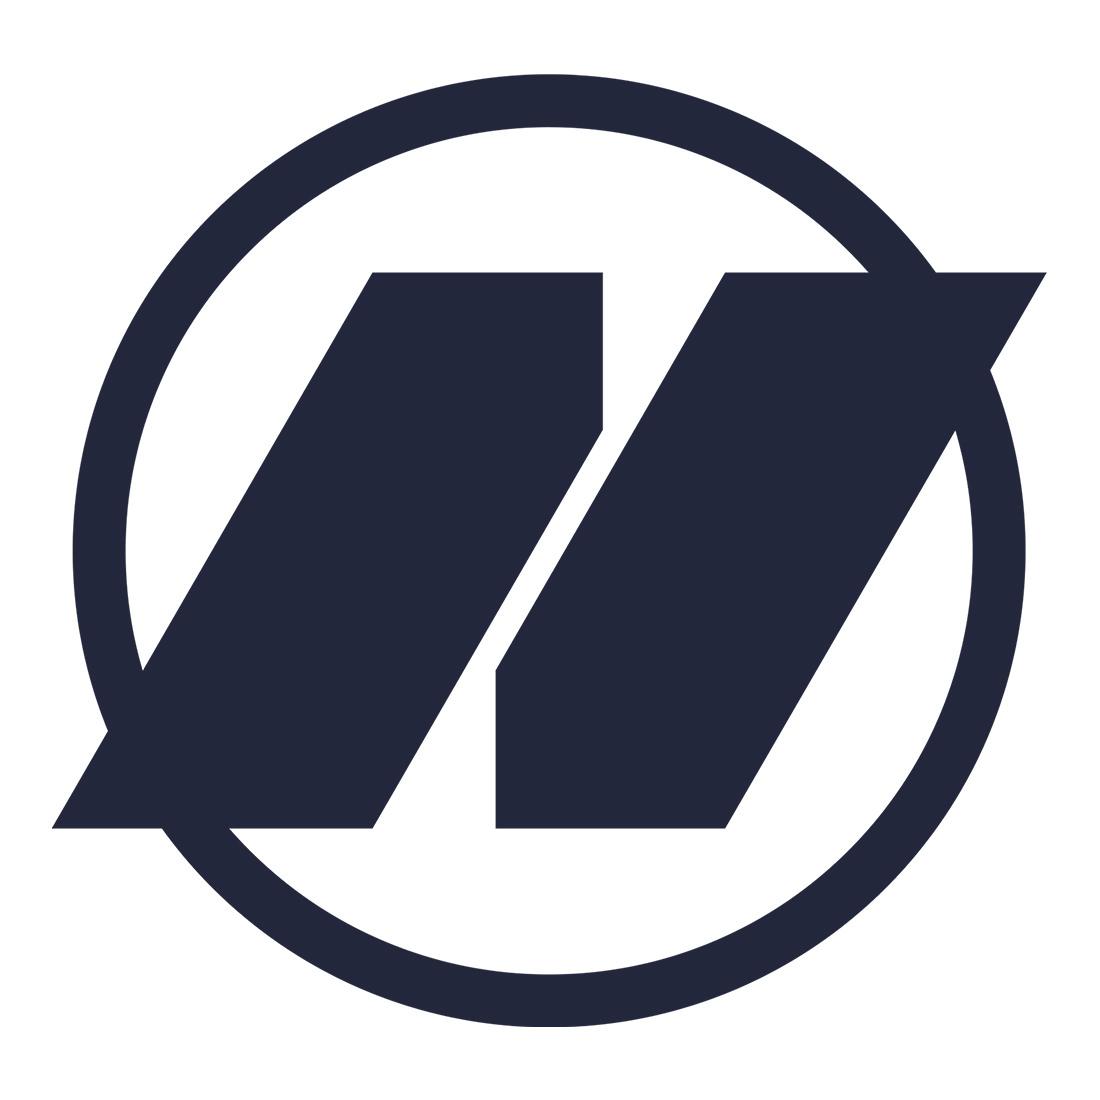 Siemens SN658D01MG Integrated Dishwasher